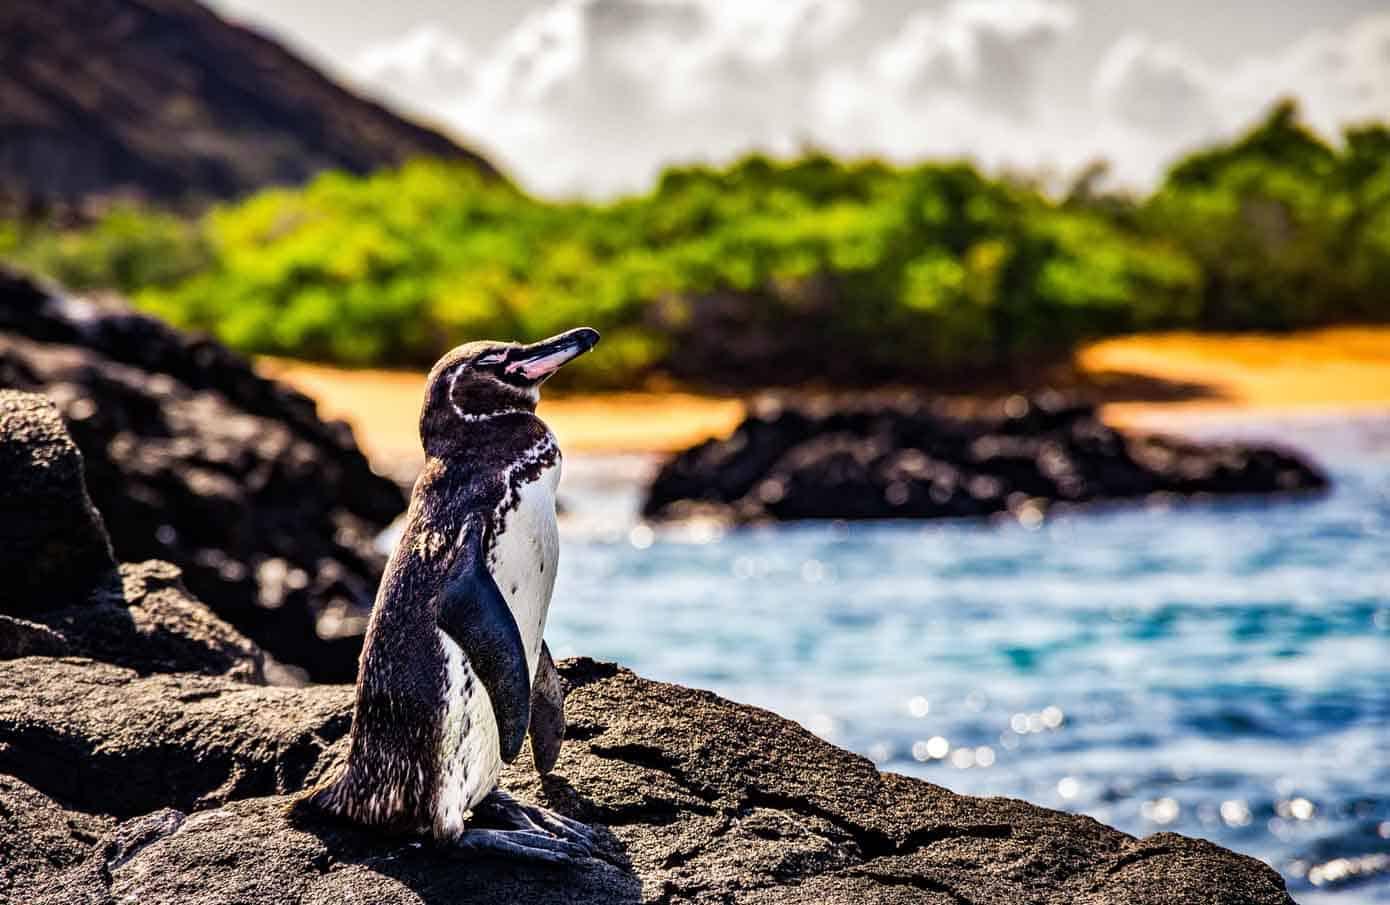 Penguin sunbathing on rocks near the ocean.